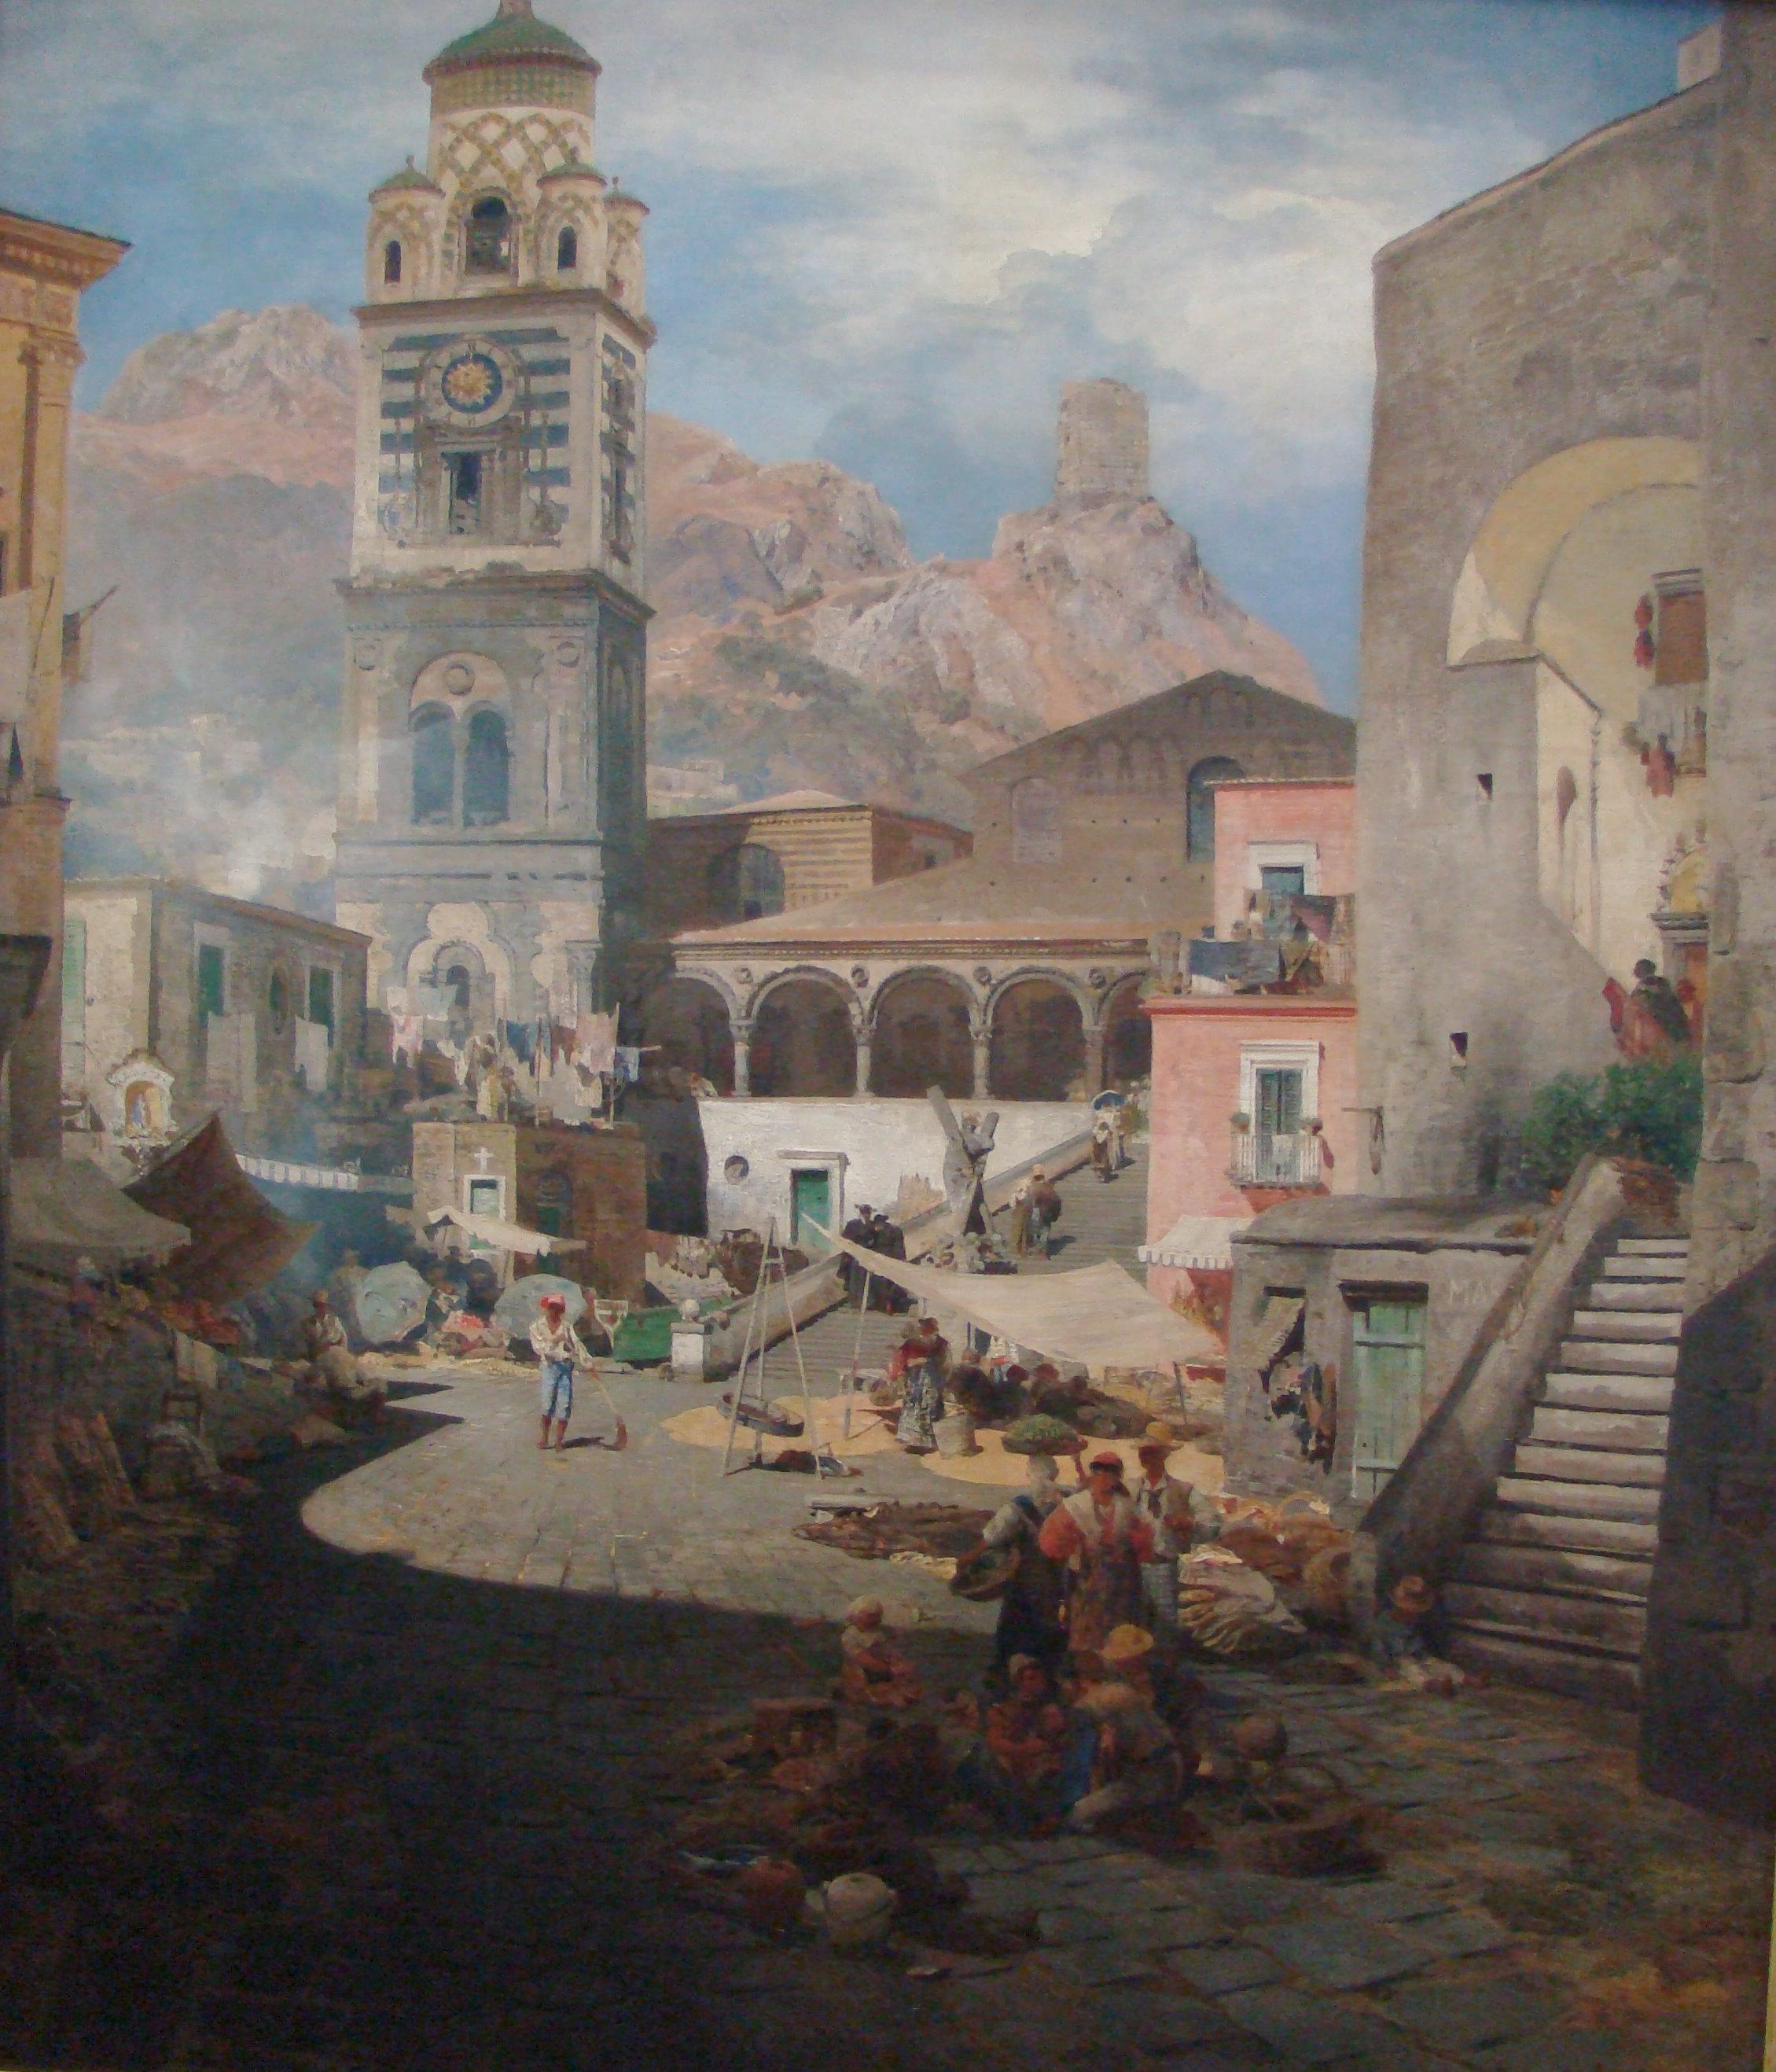 Oswald_Achenbach_Marktplatz_Amalfi.jpg